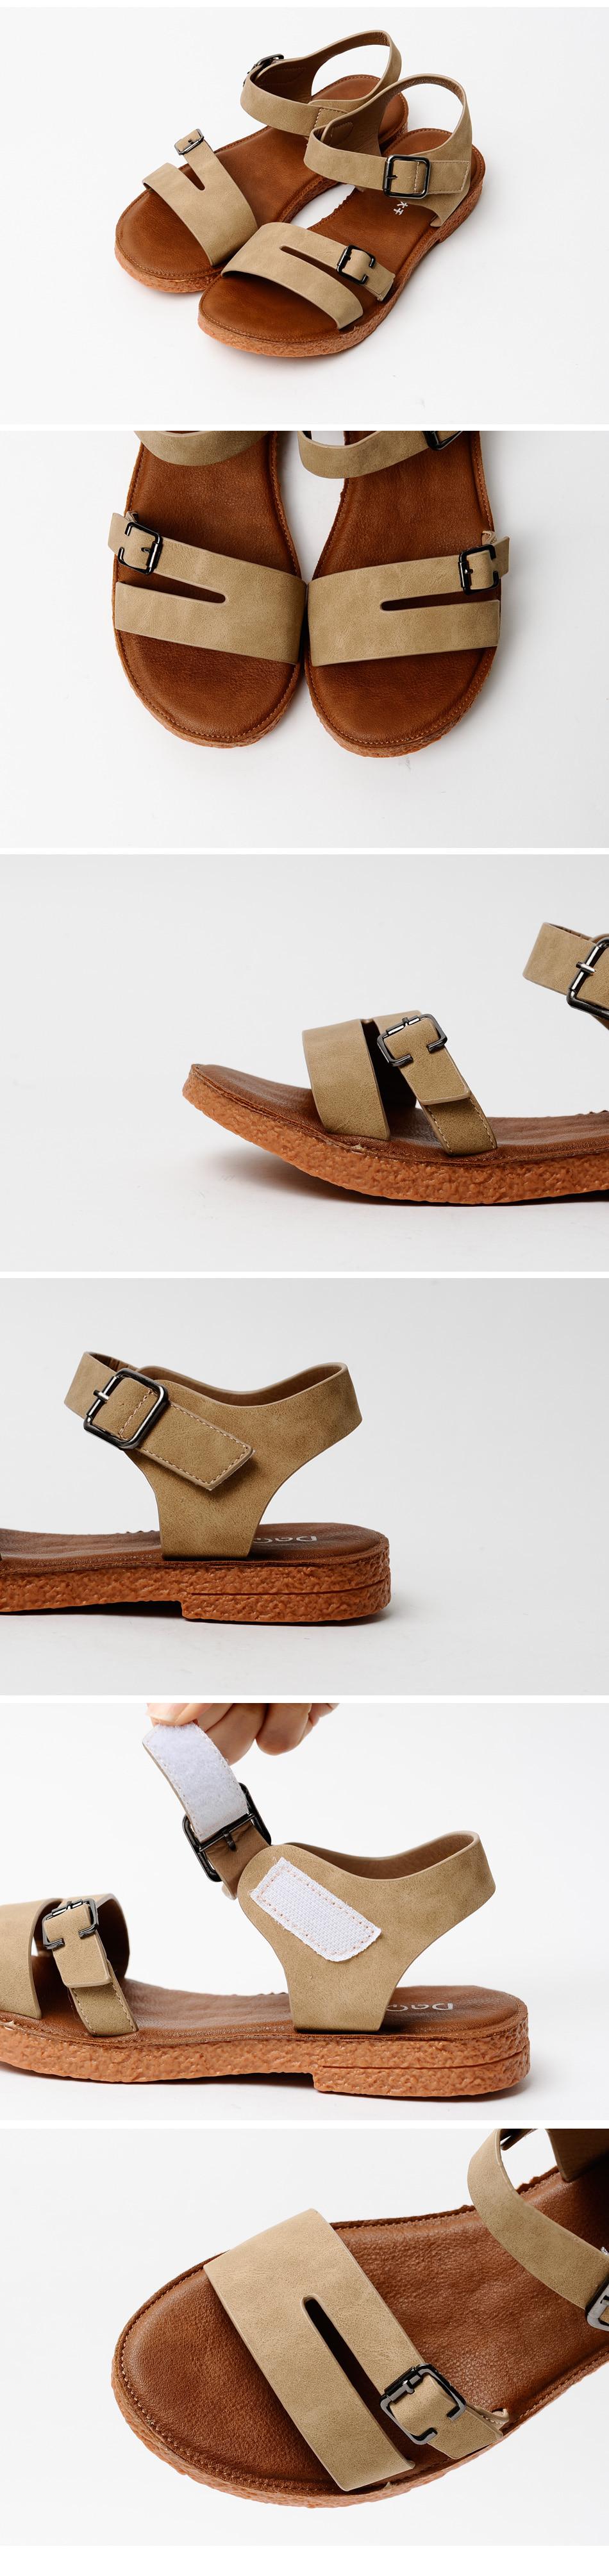 Denchia strap sandals 2cm